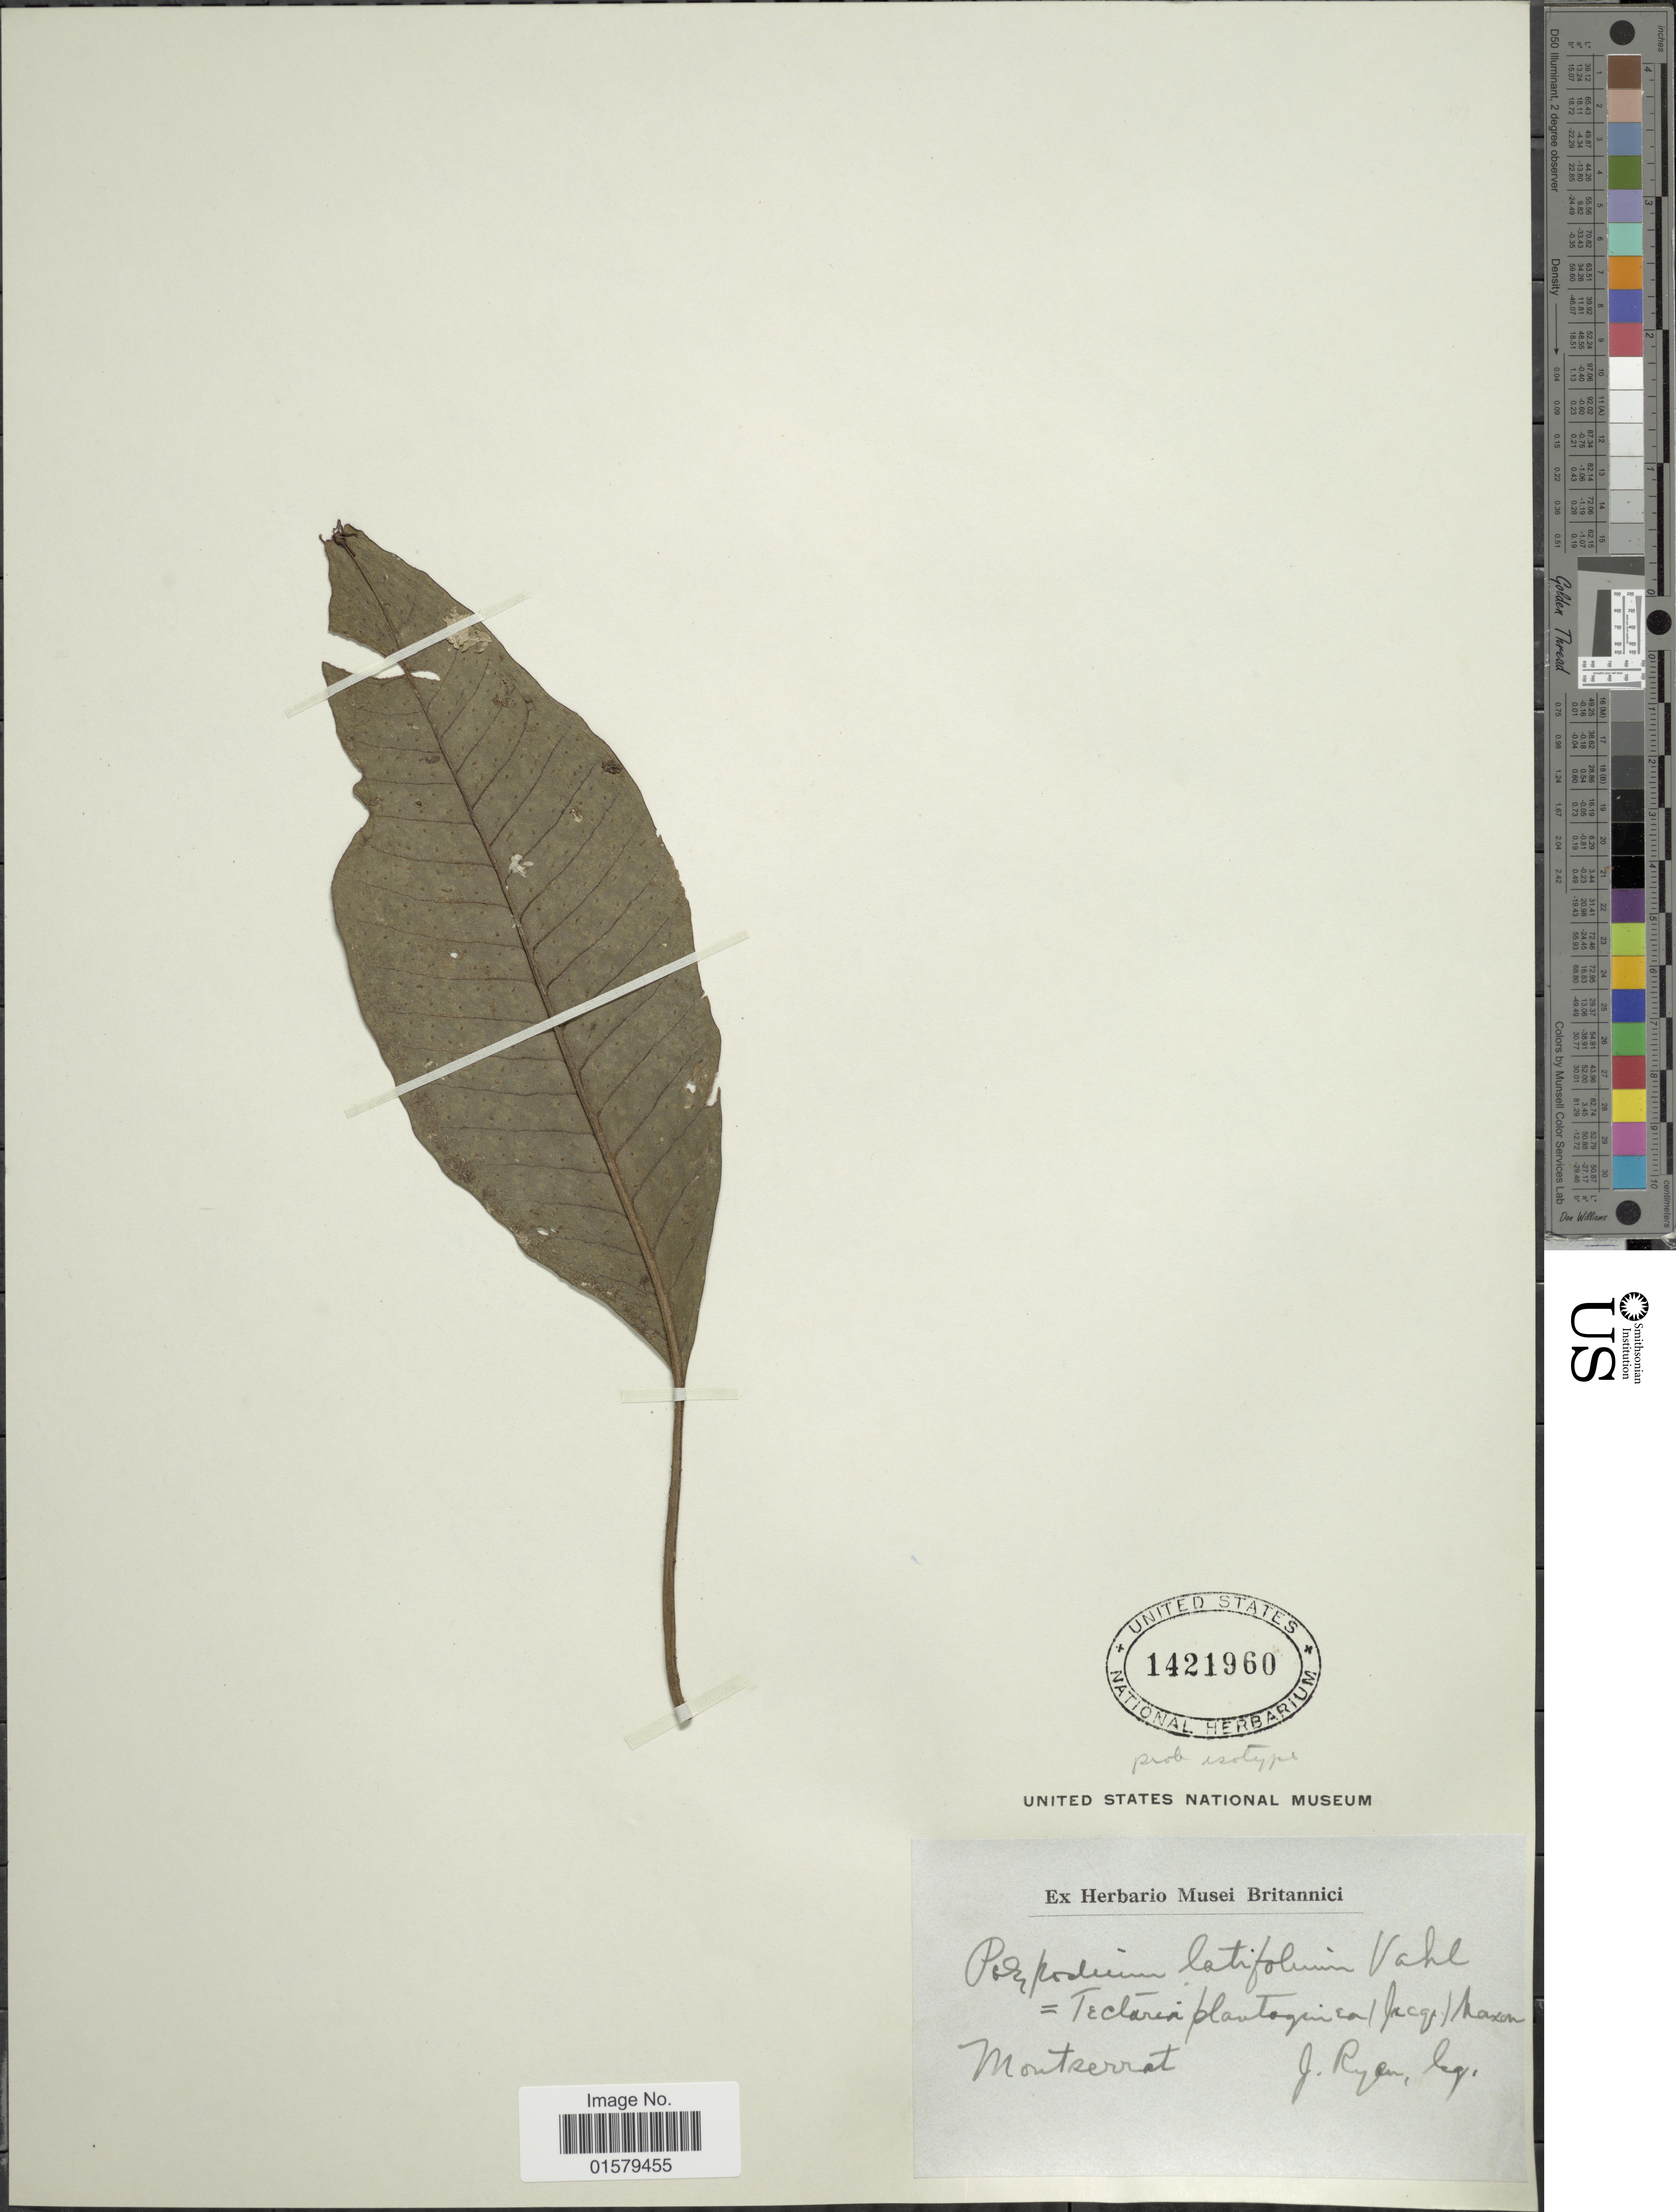 Image of plantainleaf halberd fern